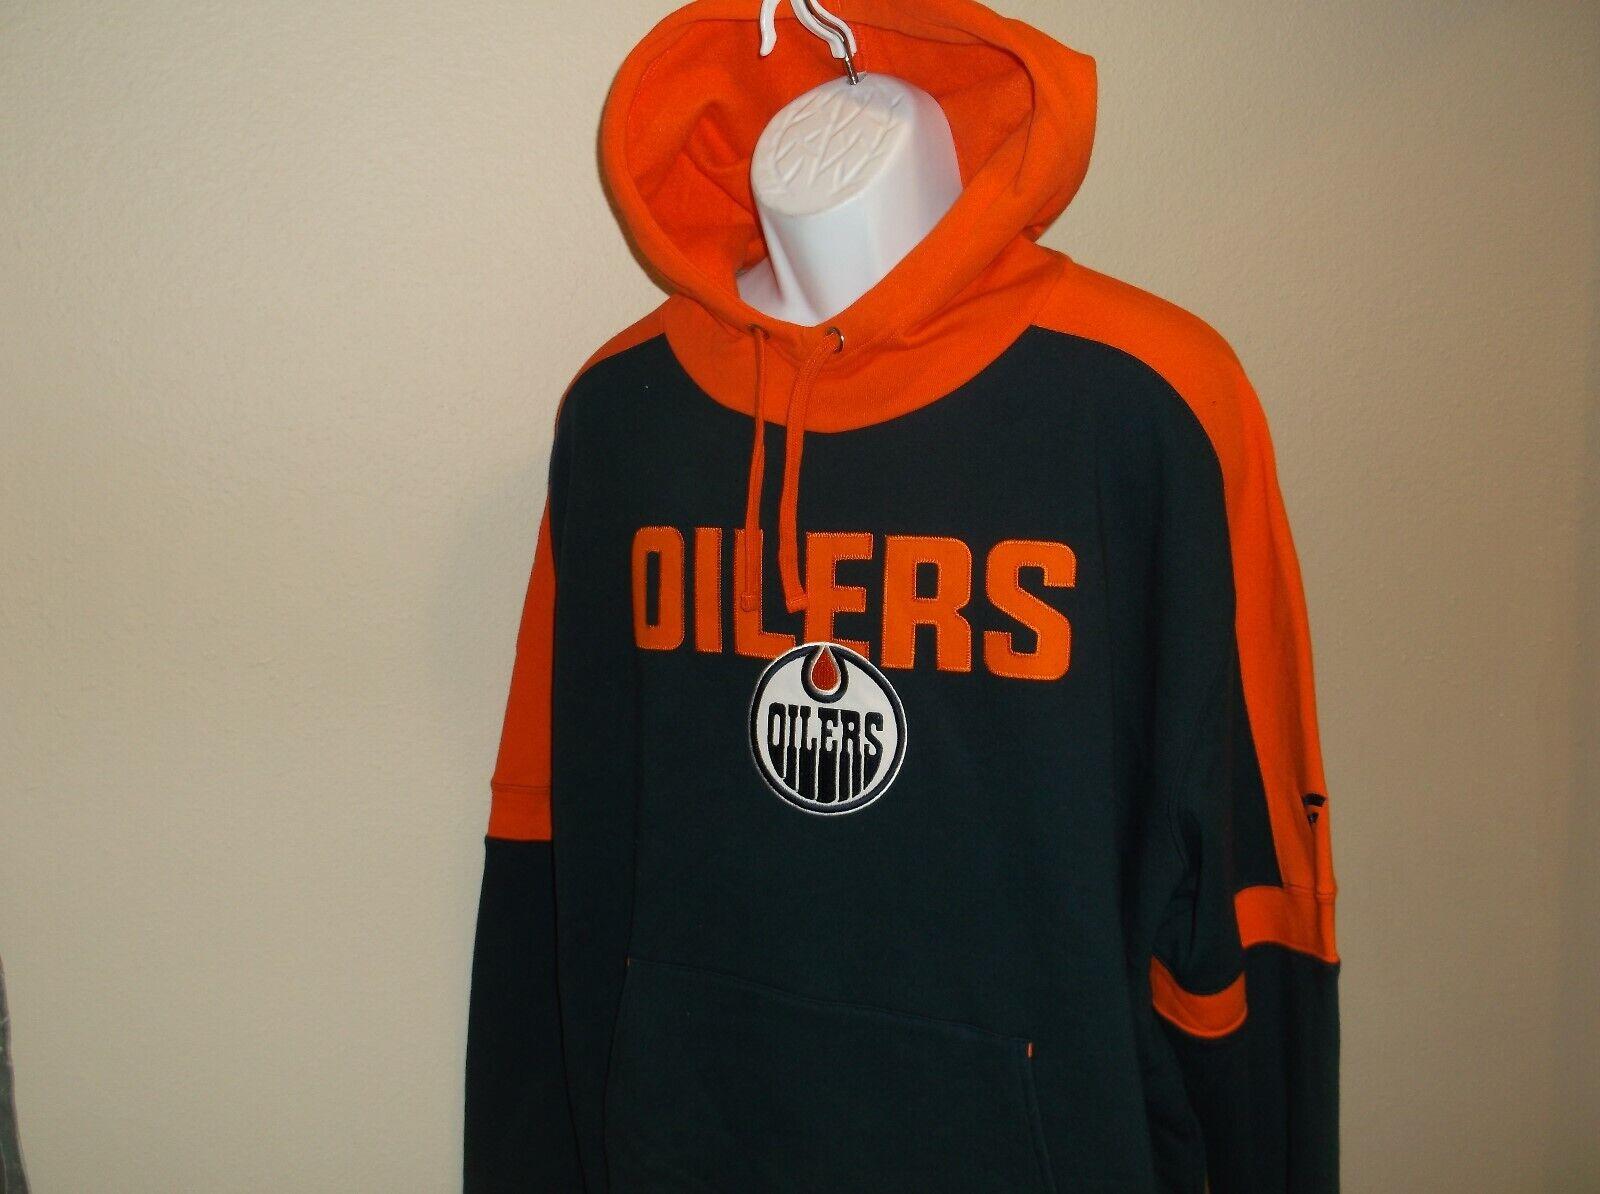 Edmonton Oilers Fanatics Hoodie Sweatshirt Men's Medium nwt